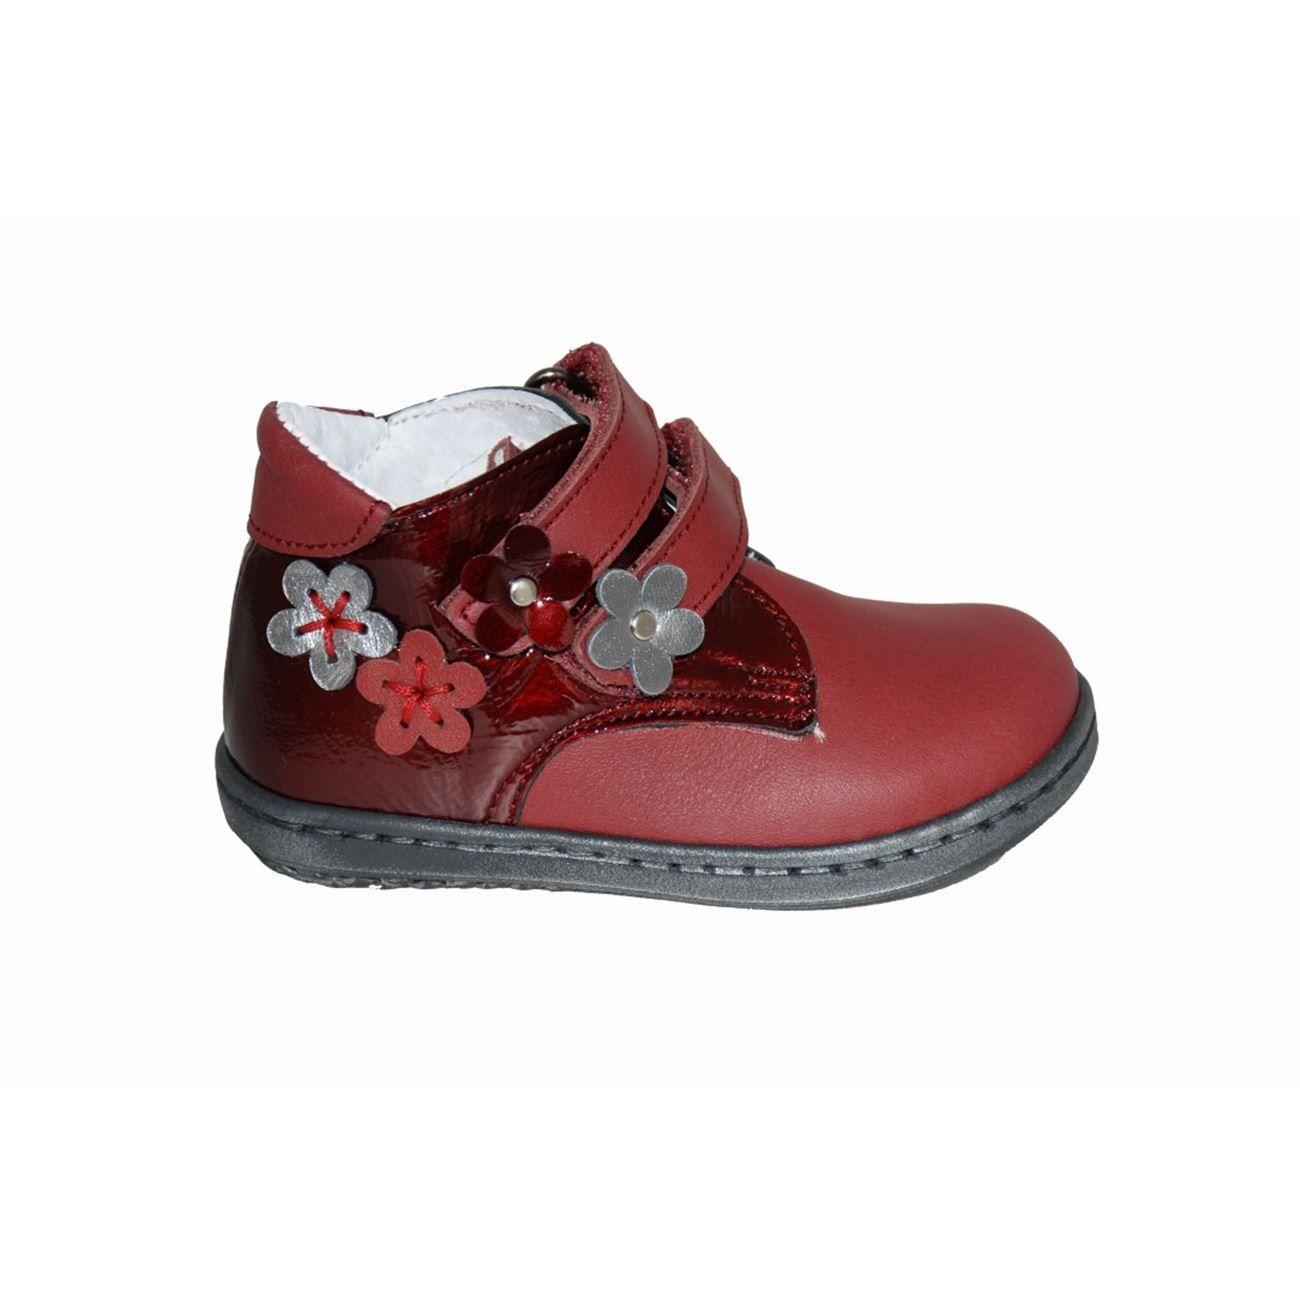 795b83140f2 Μποτάκι πρώτα βήματα δερμάτινο μπορντό, αυτοκόλλητα κουμπώματα, ανατομικό  πέλμα, σχέδιο με λουλούδια, ΜΟΥΓΕΡ